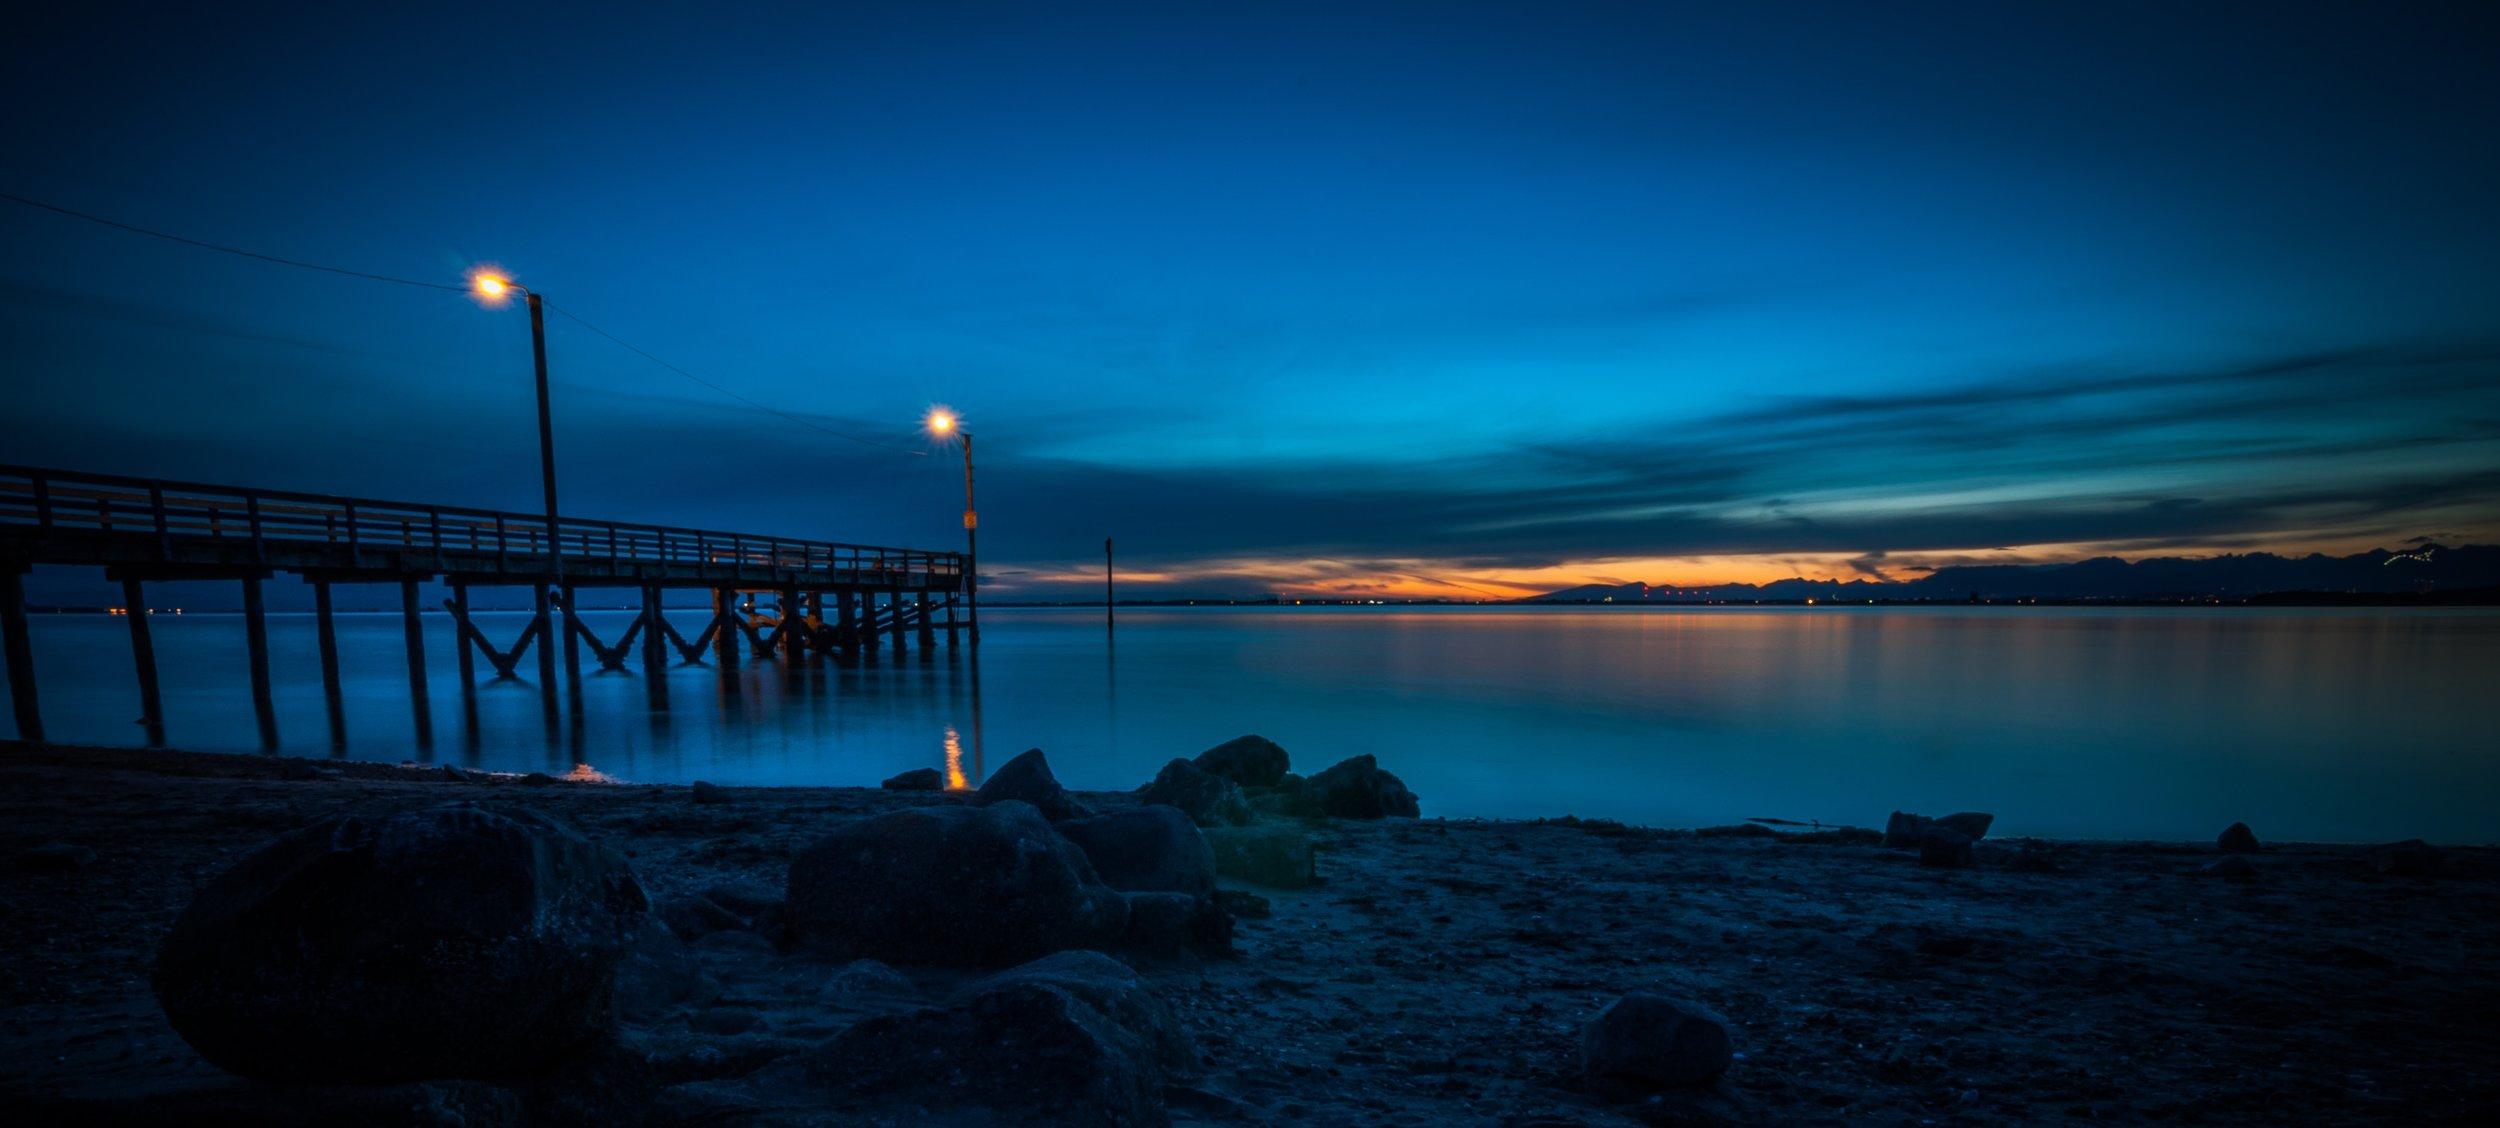 Crescent Beach at dusk.